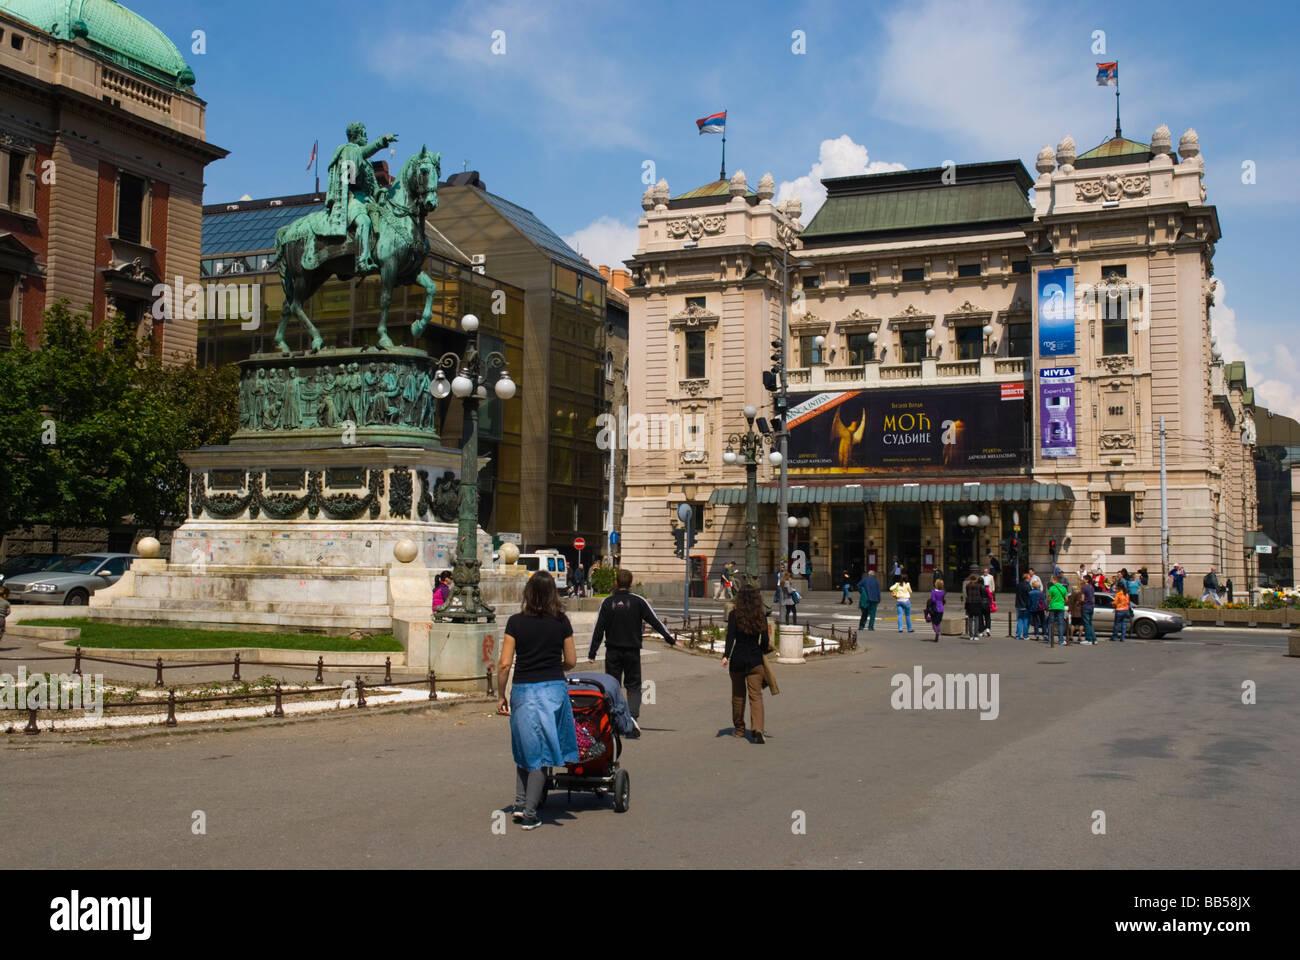 Trg Republike square in central Belgrade Serbia Europe Stock Photo